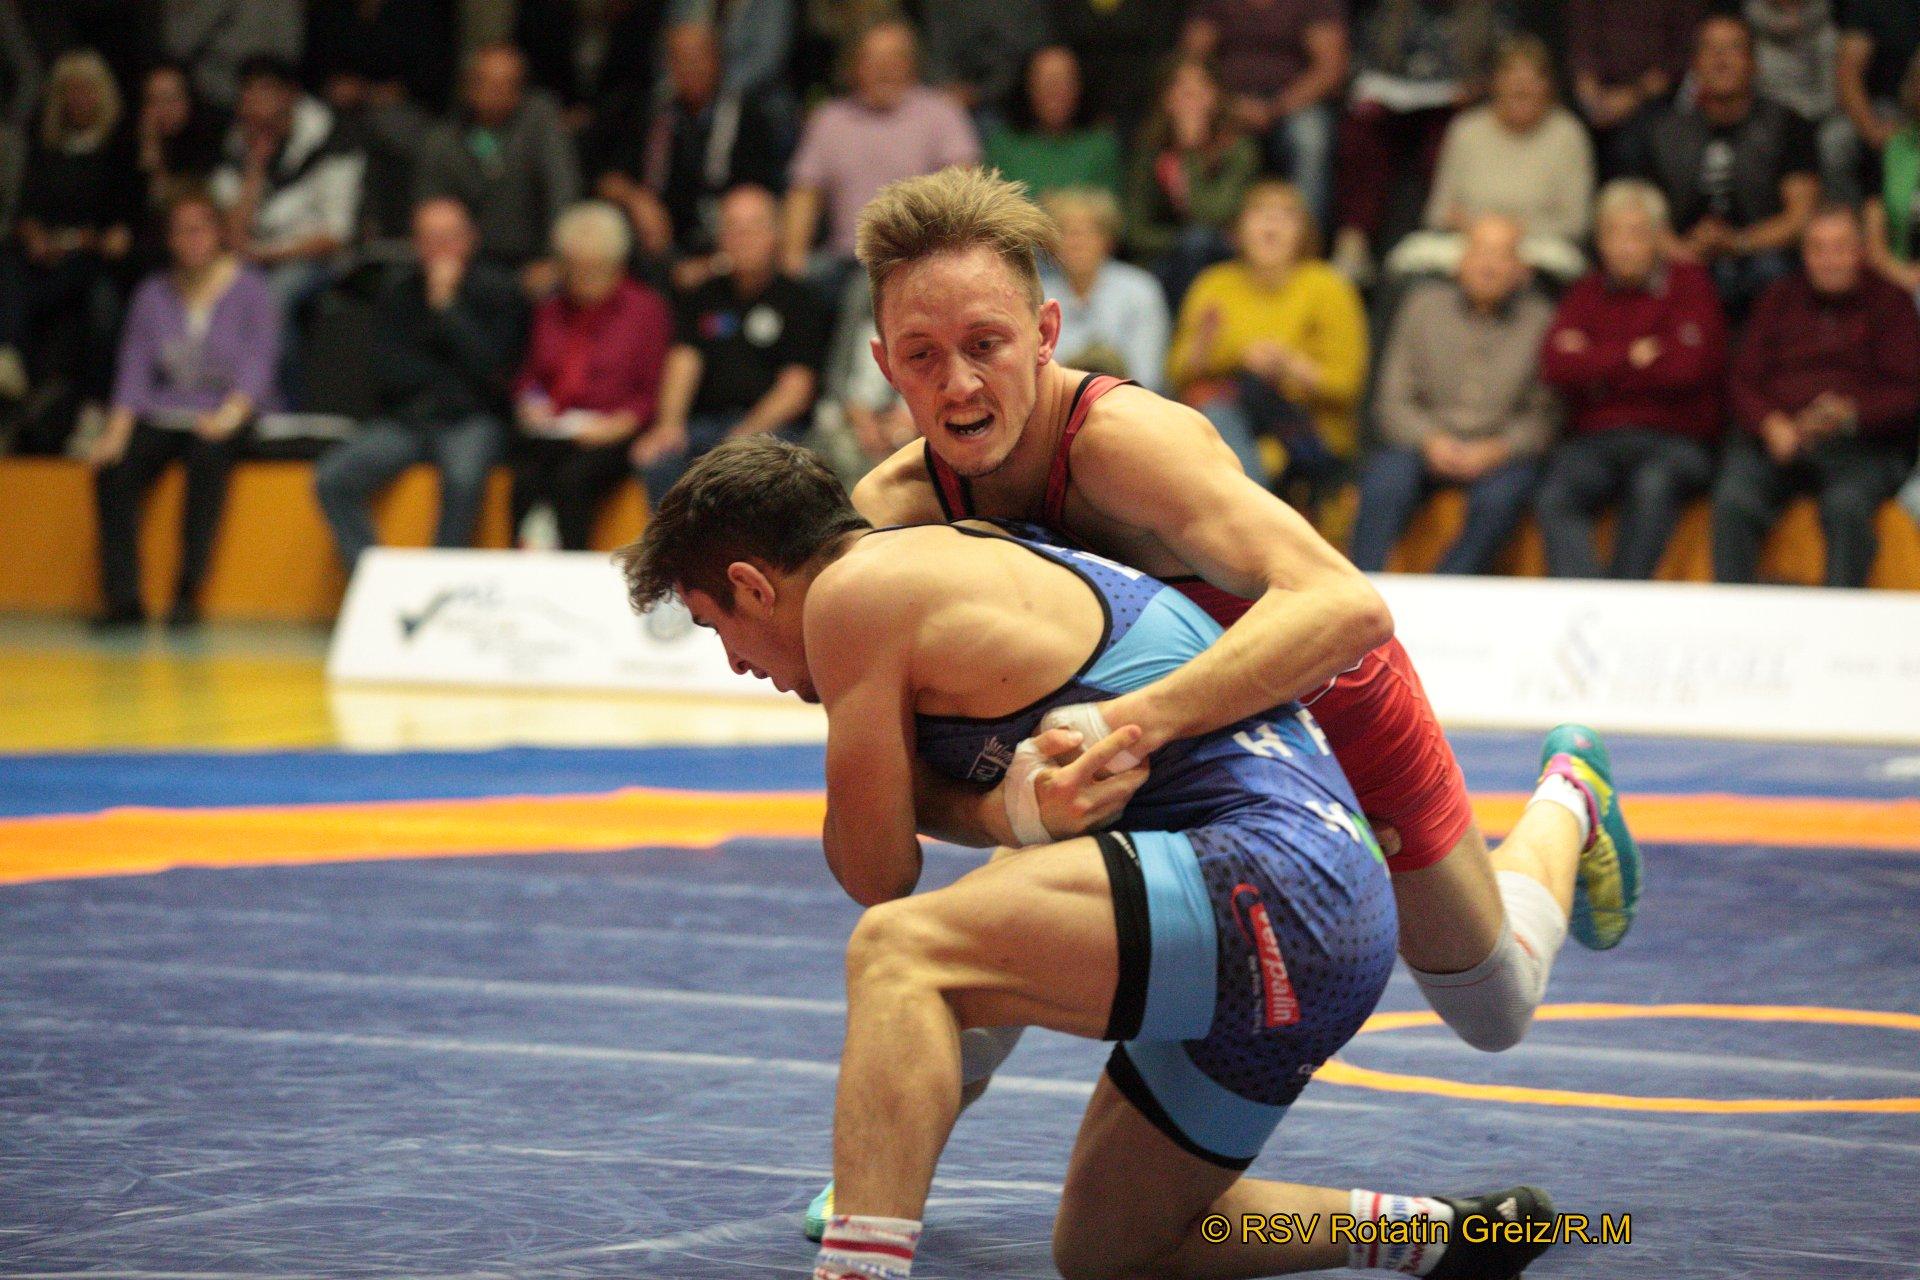 57kg Freistil: Sven Cammin (2) (rotes Trikot), RSV Rotation Greiz gegen Ahmet Duman EU (5), AC Lichtenfels 0:4/TÜ/4:19/03:52